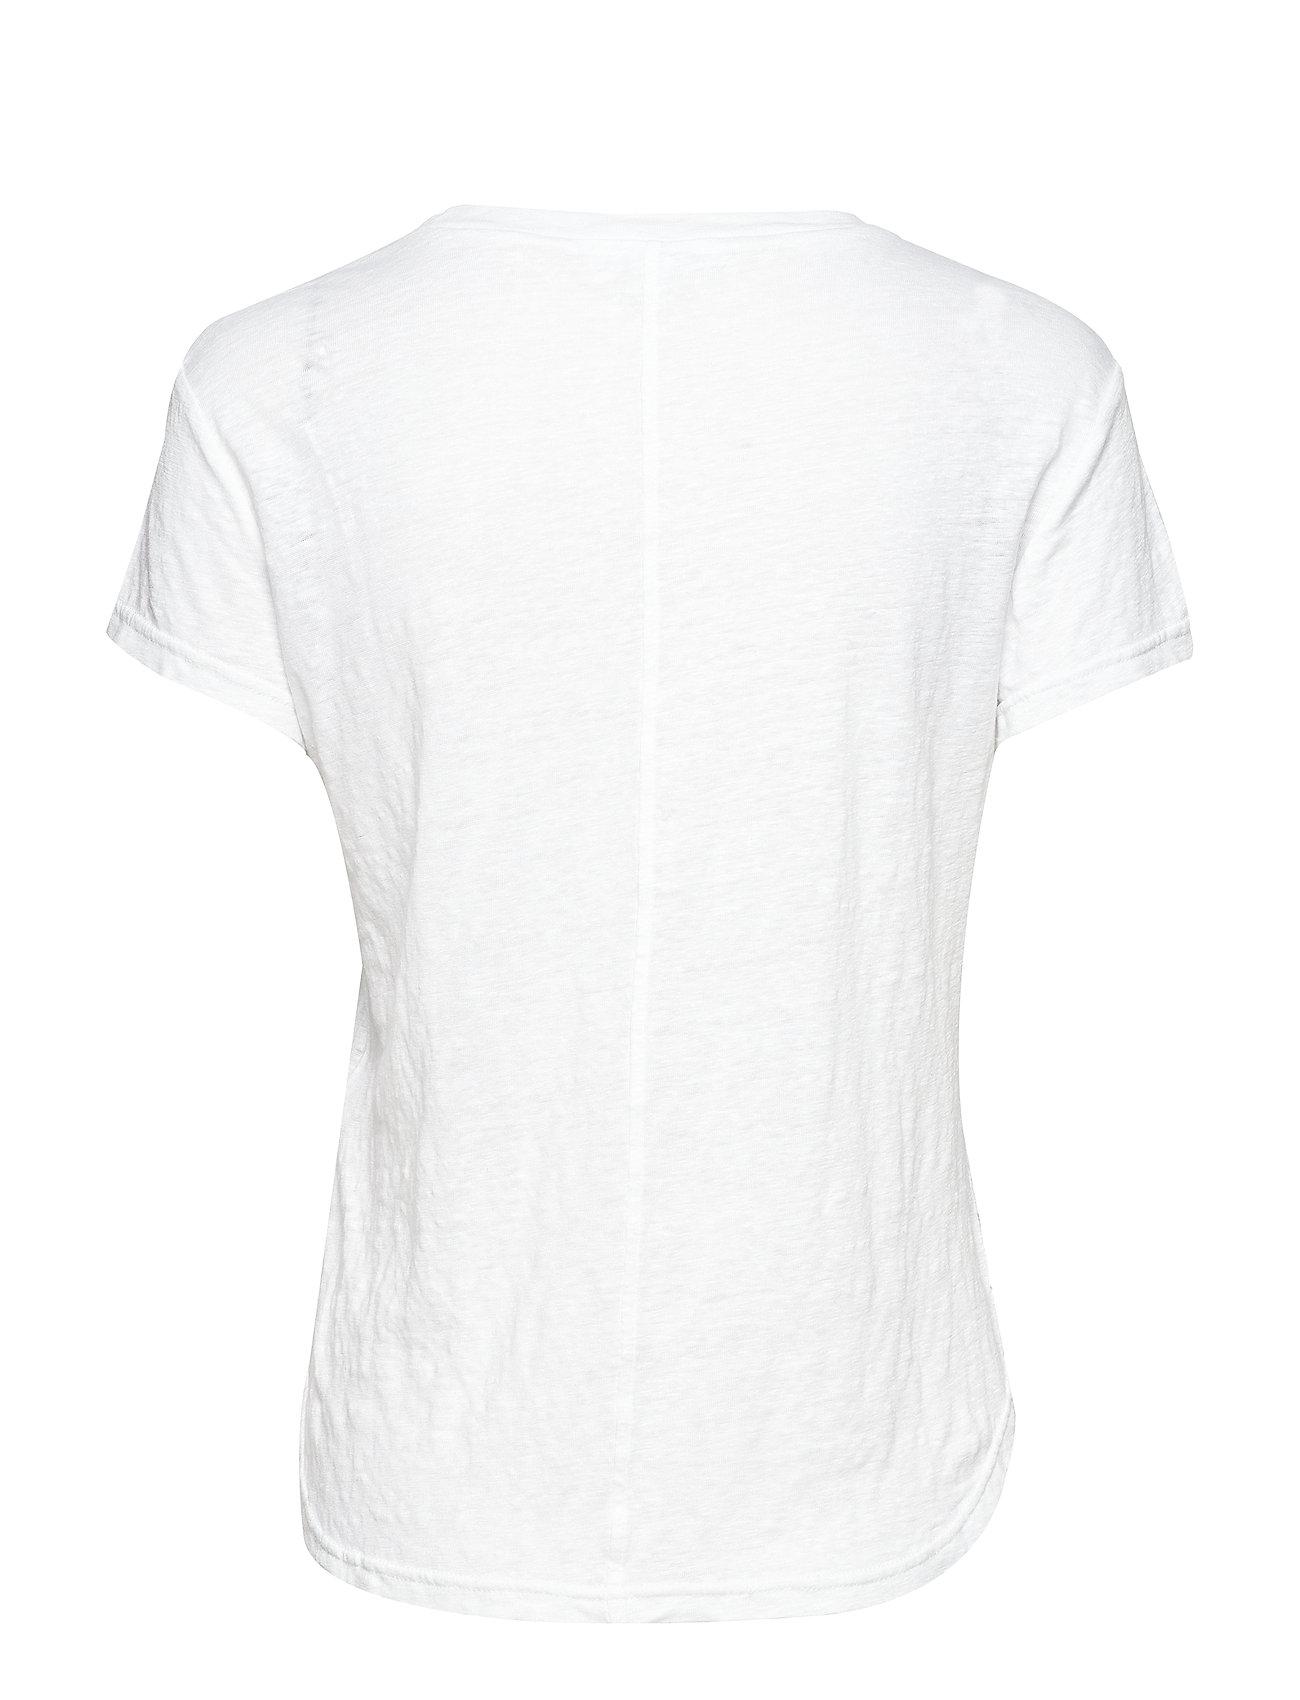 FRAME    CLASSIC LINEN CREW  - T-Shirts & Tops    BLANC